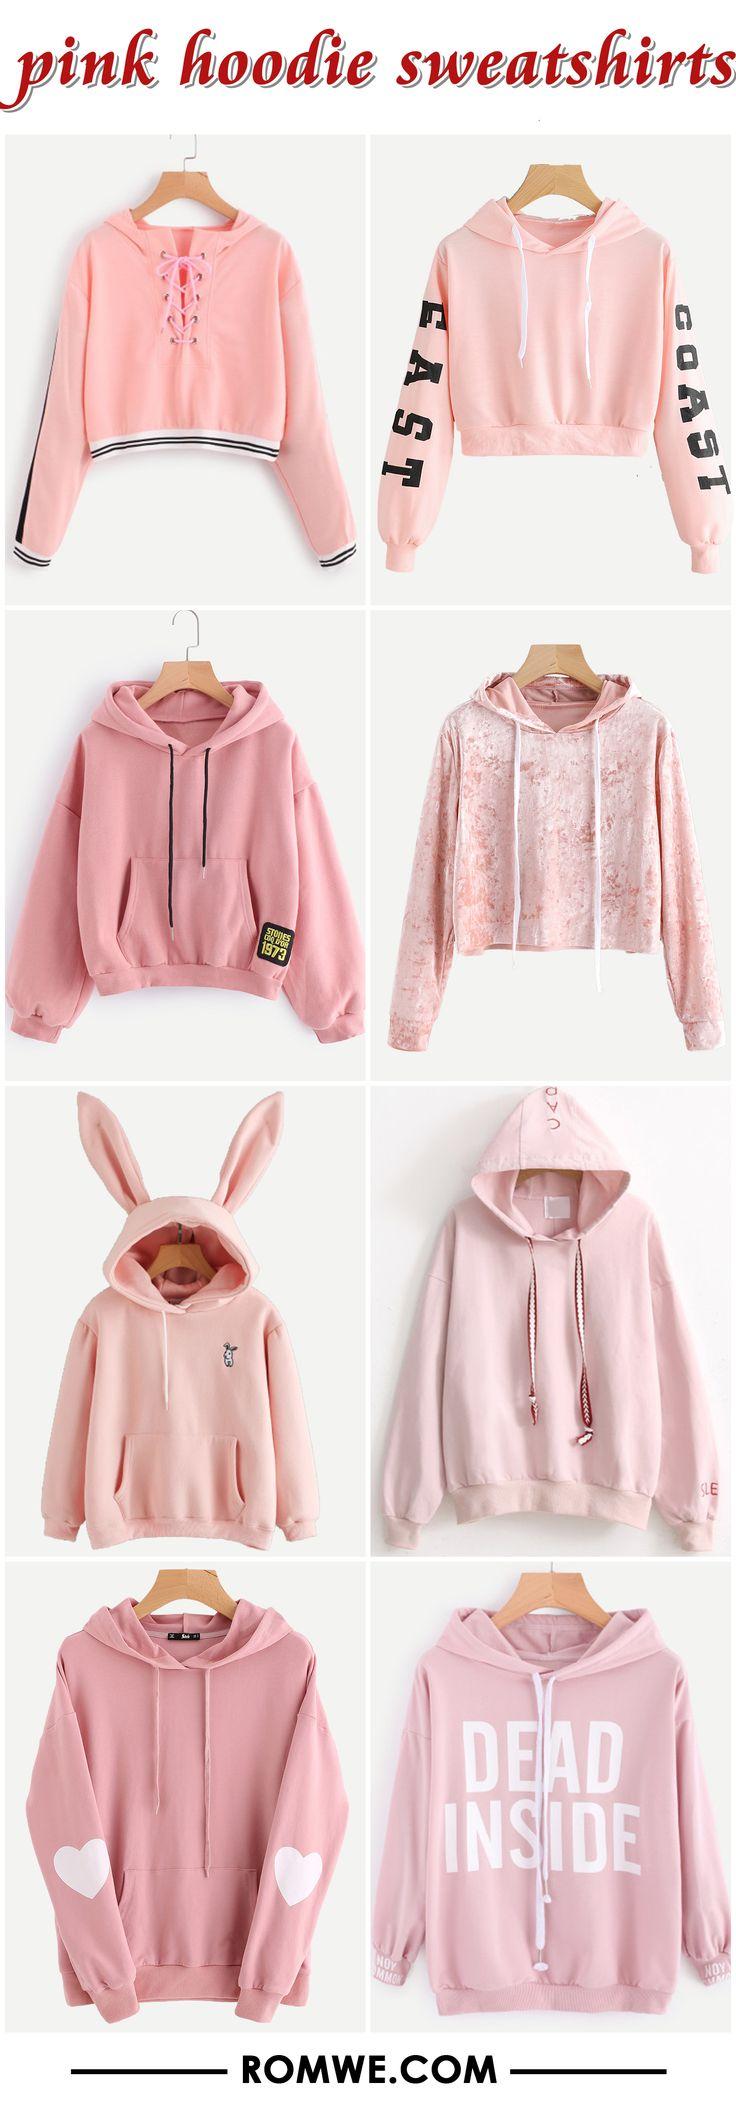 black friday sale - pink hoodie sweatshirts from romwe.com